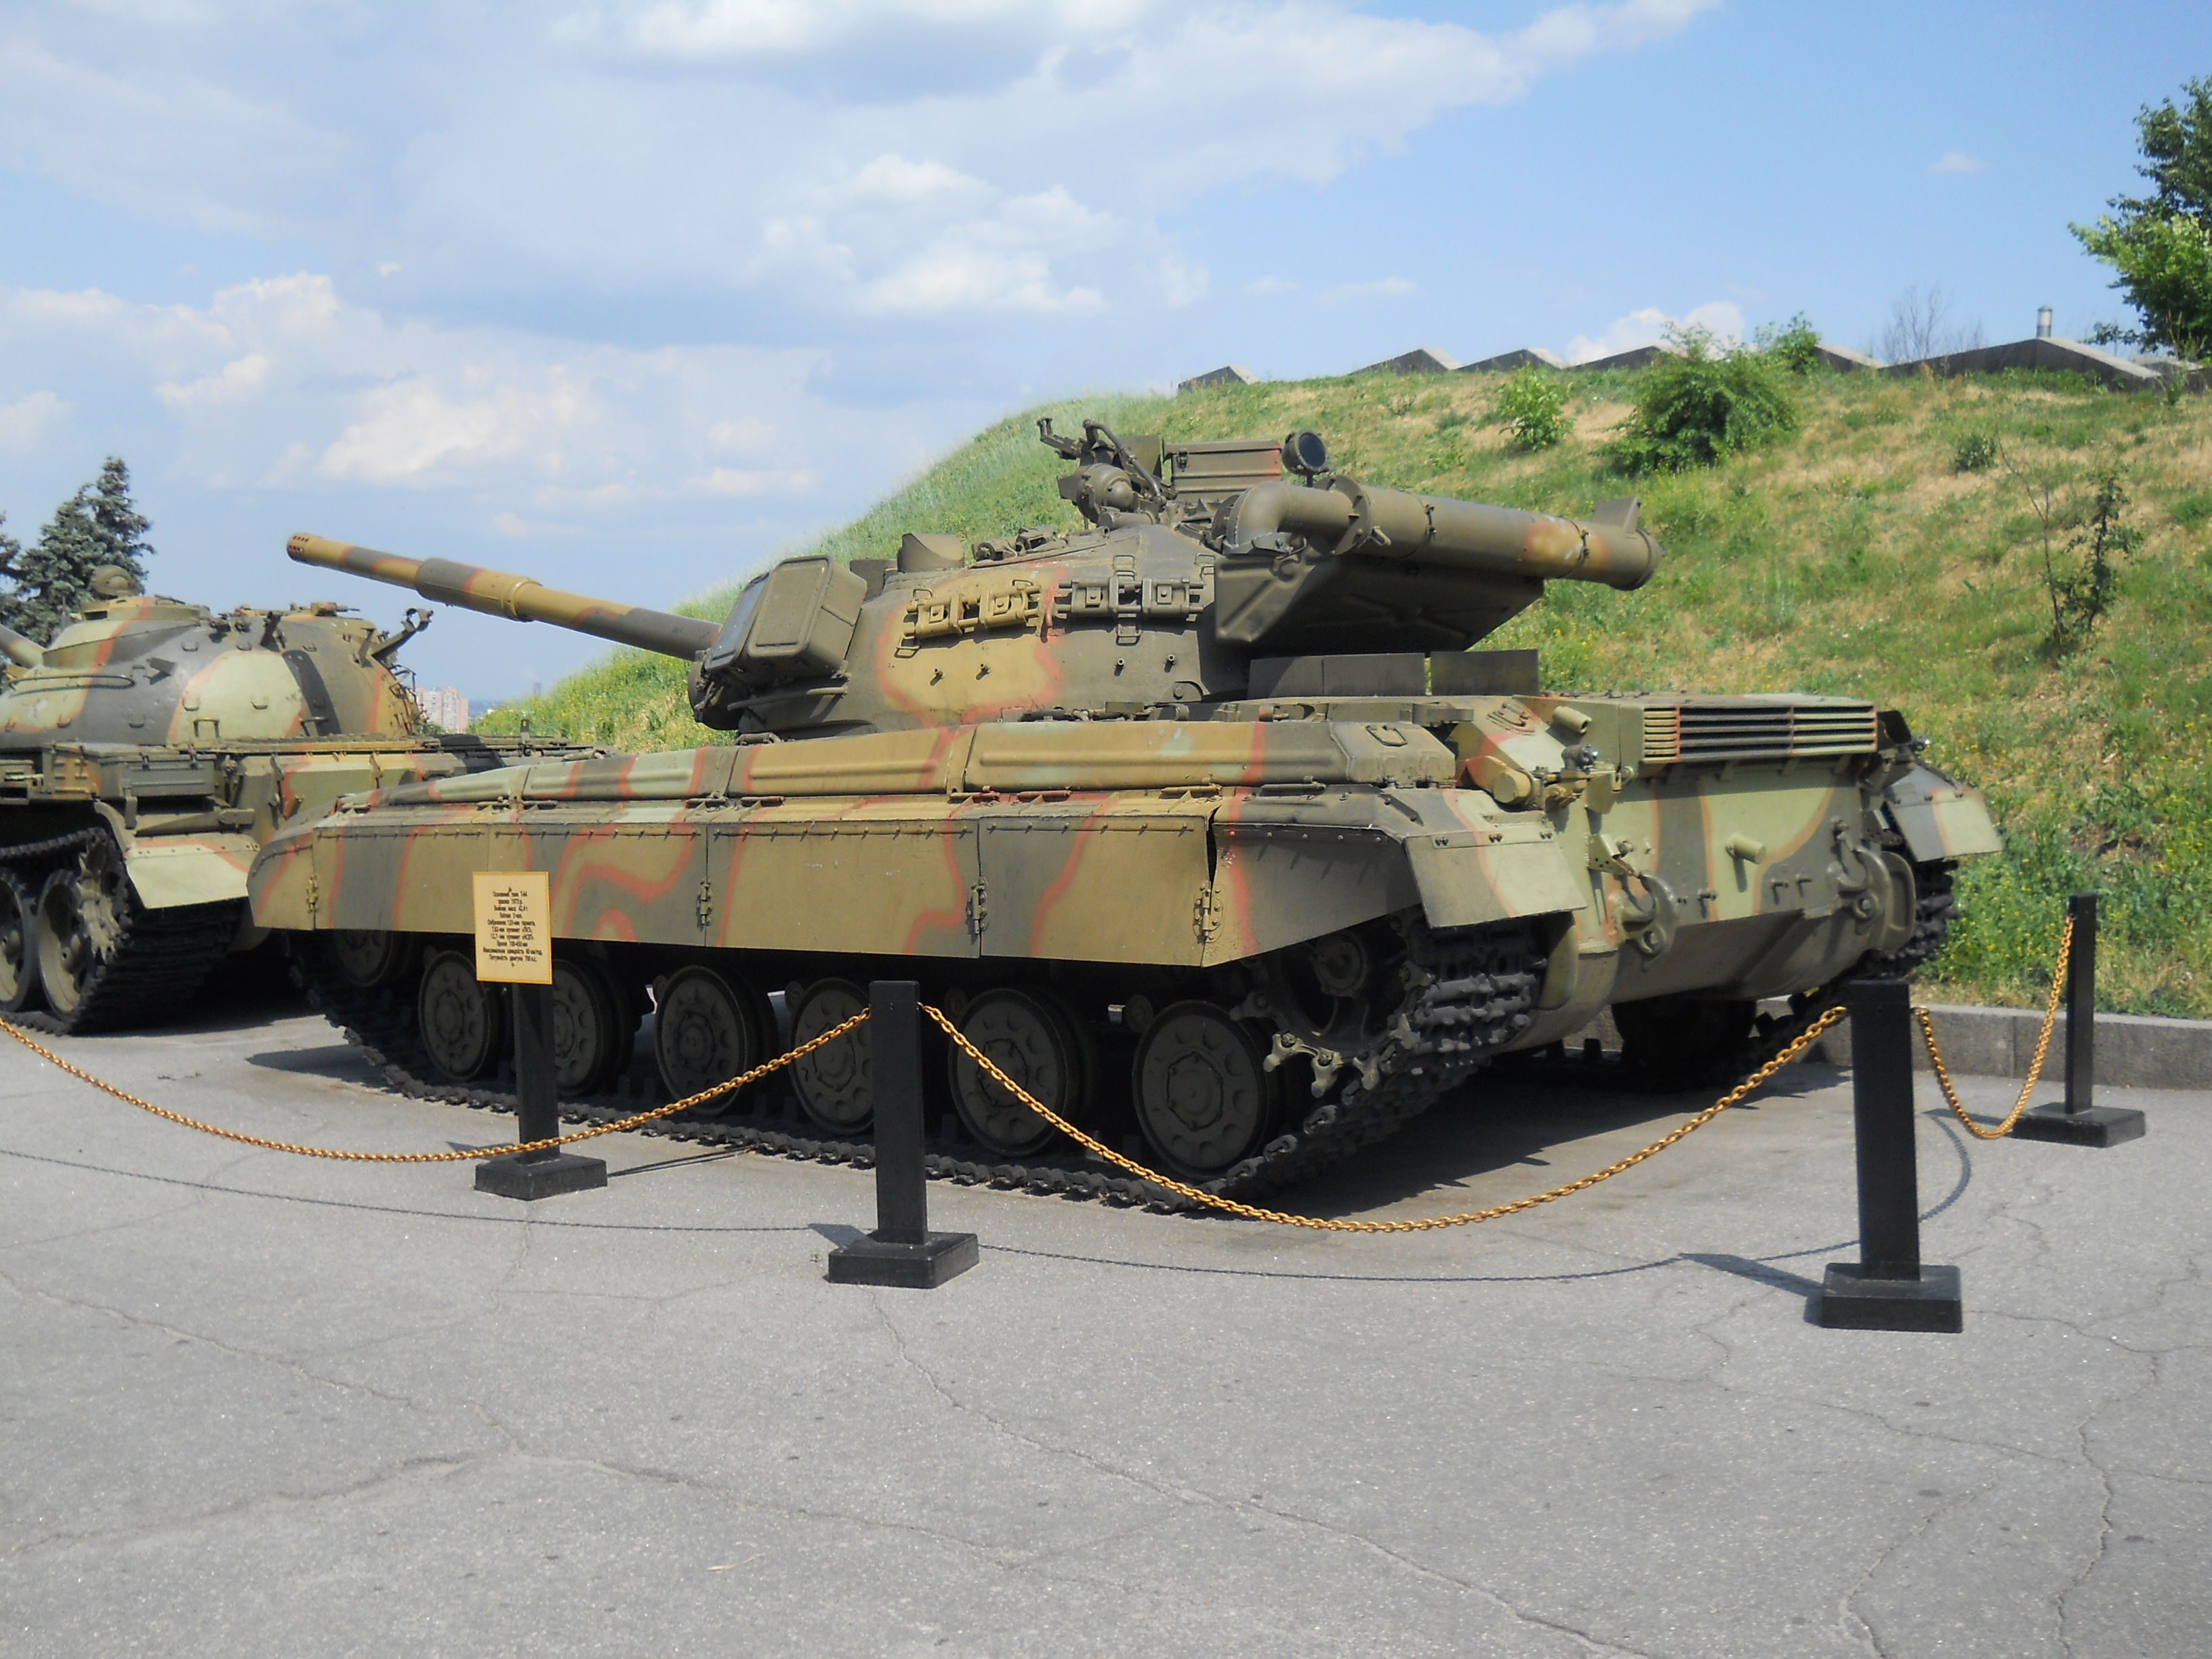 T-64 tank